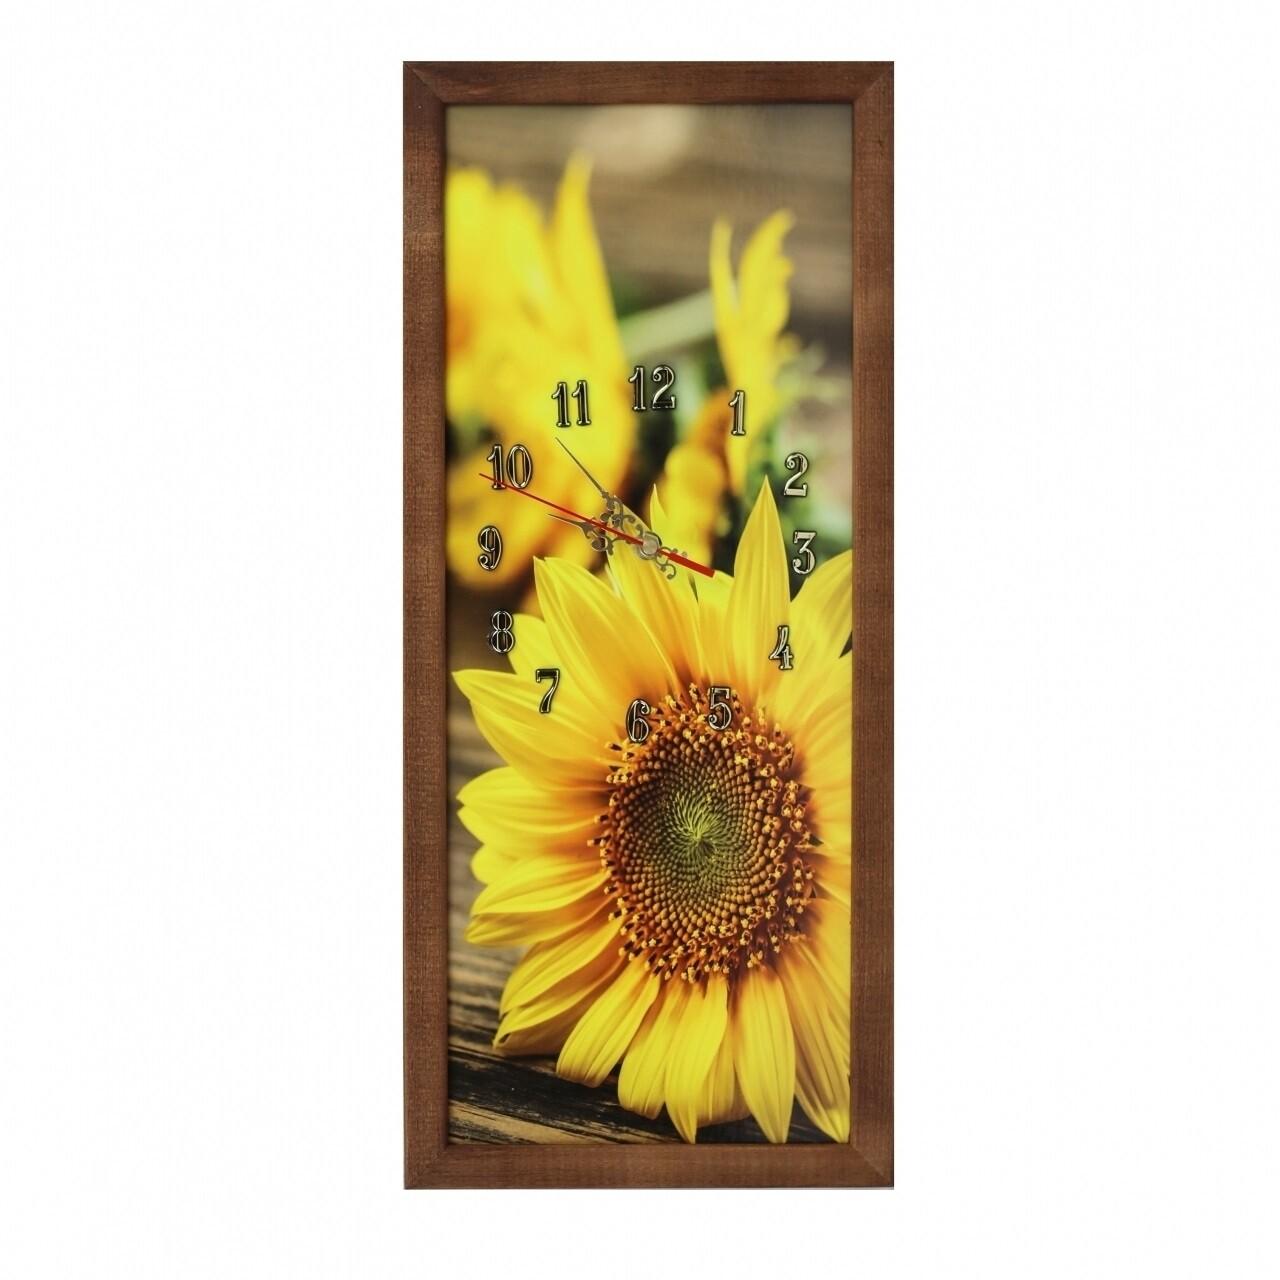 Tablou cu ceas Sunflower, Heinner Home, 20x50 cm, lemn